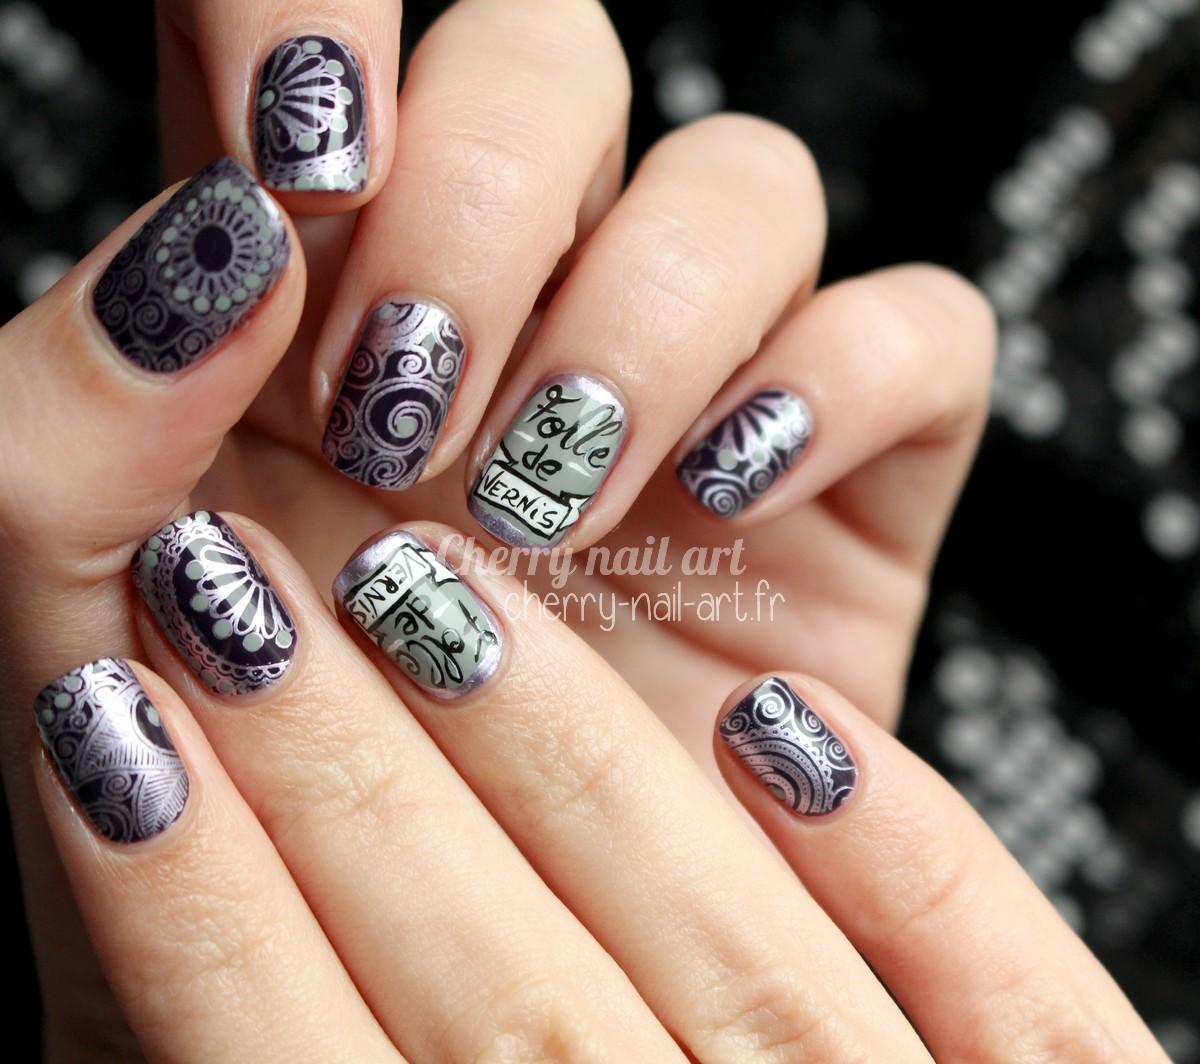 nail-art-écriture-folle-de-vernis-stamping